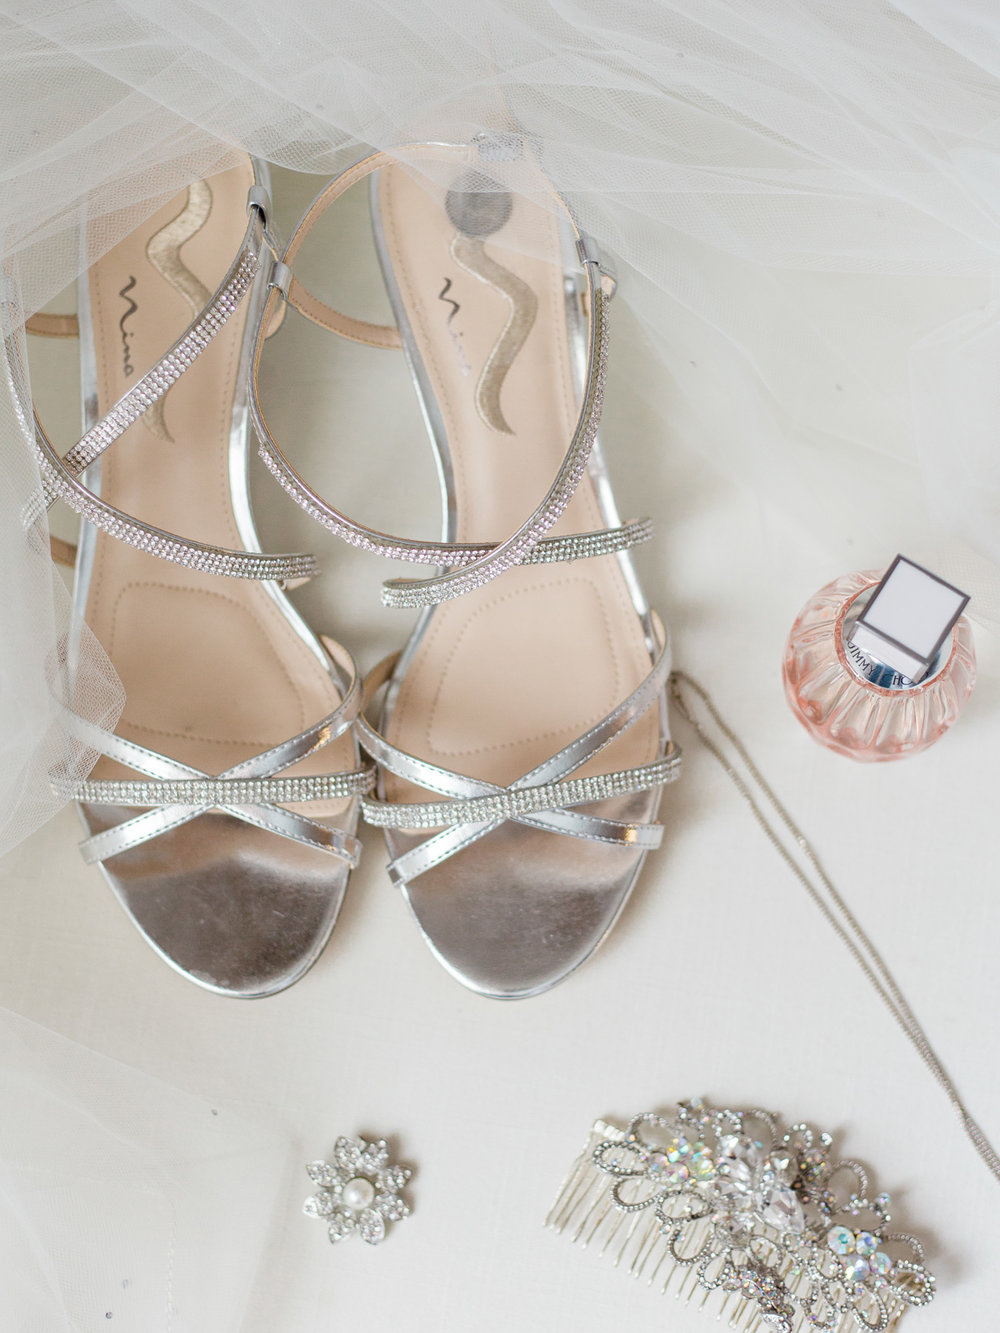 vibrant-tangier-akron-wedding-photos-by-matt-erickson-photography-2.jpg